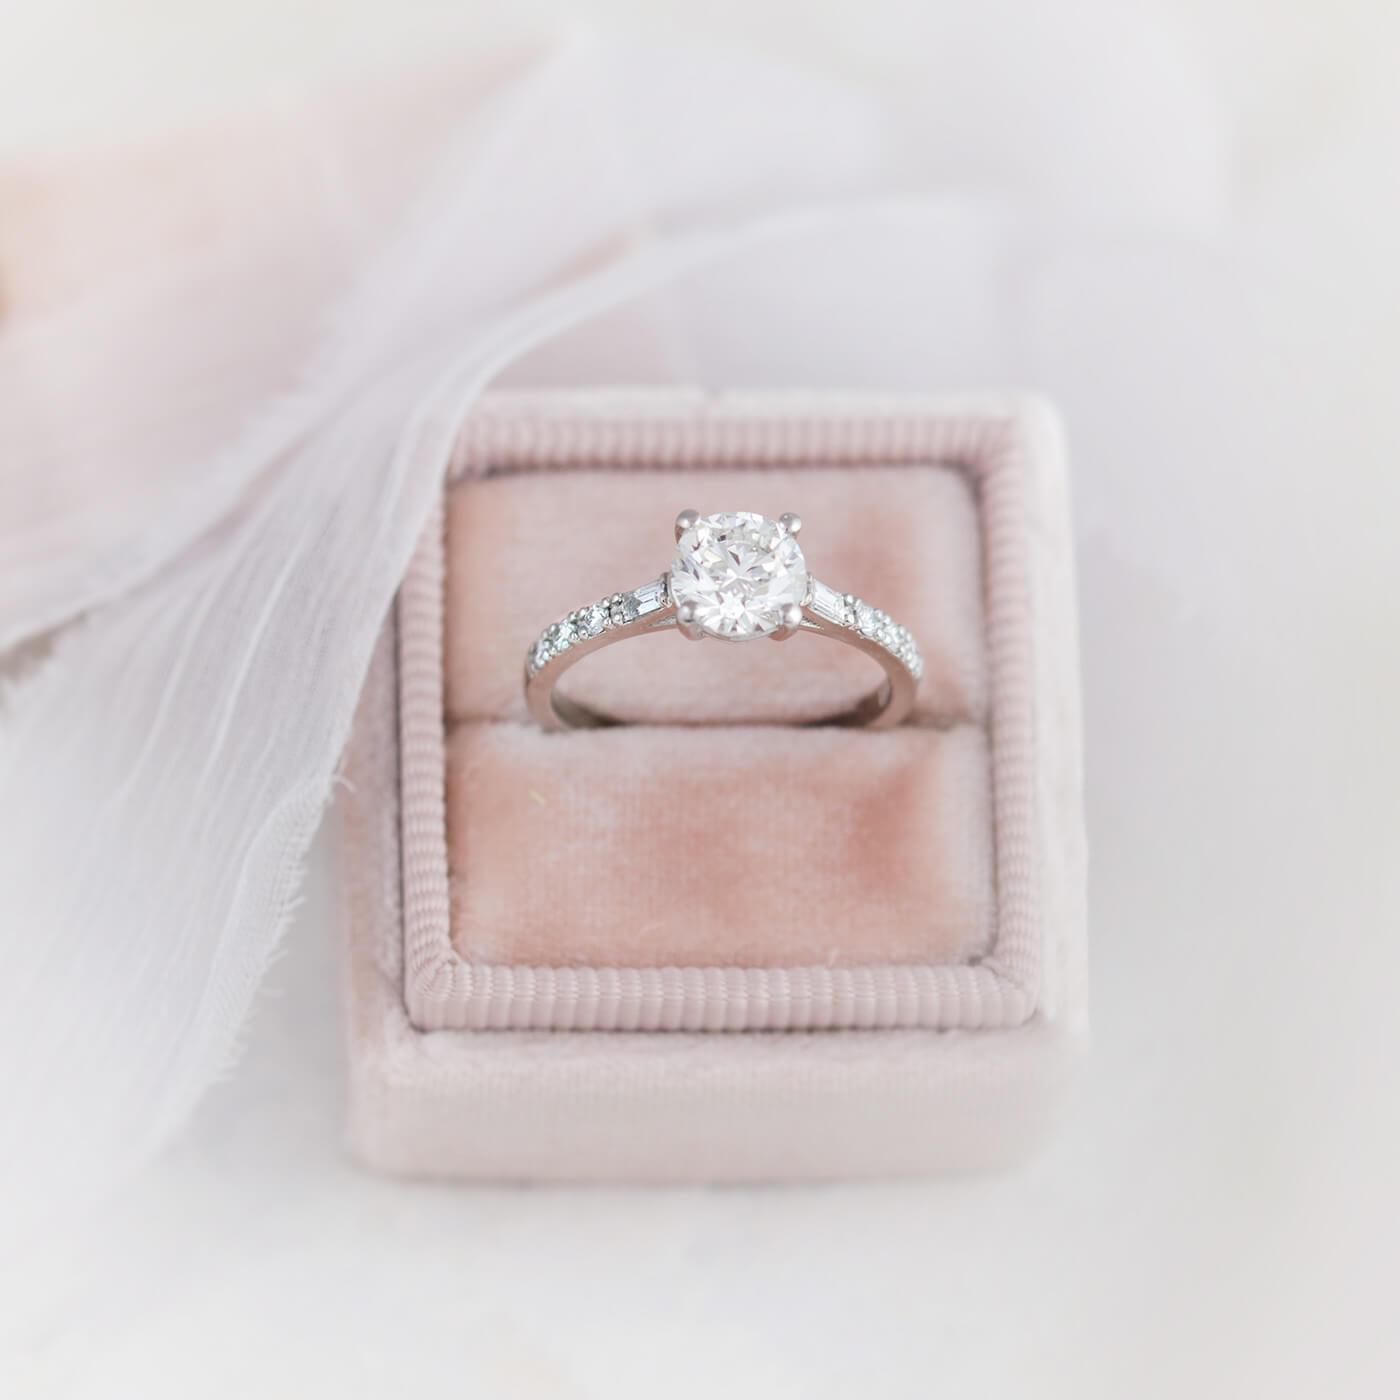 Custom Pave Engagement Ring Setting